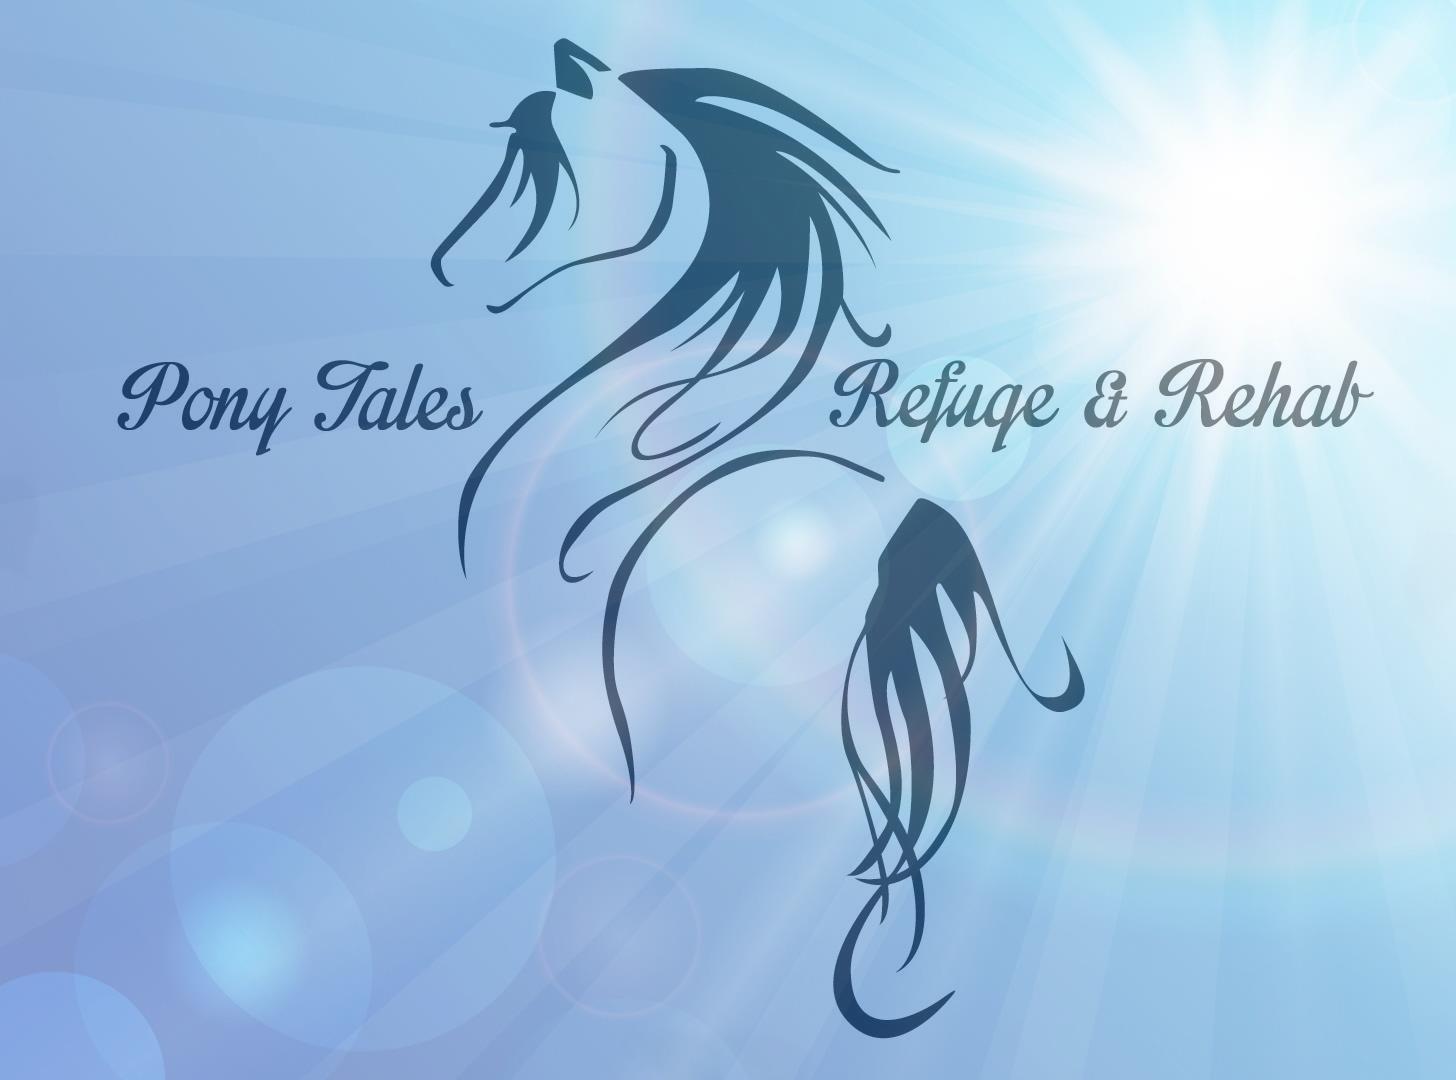 Pony Tales Refuge & Rehab, Inc. image